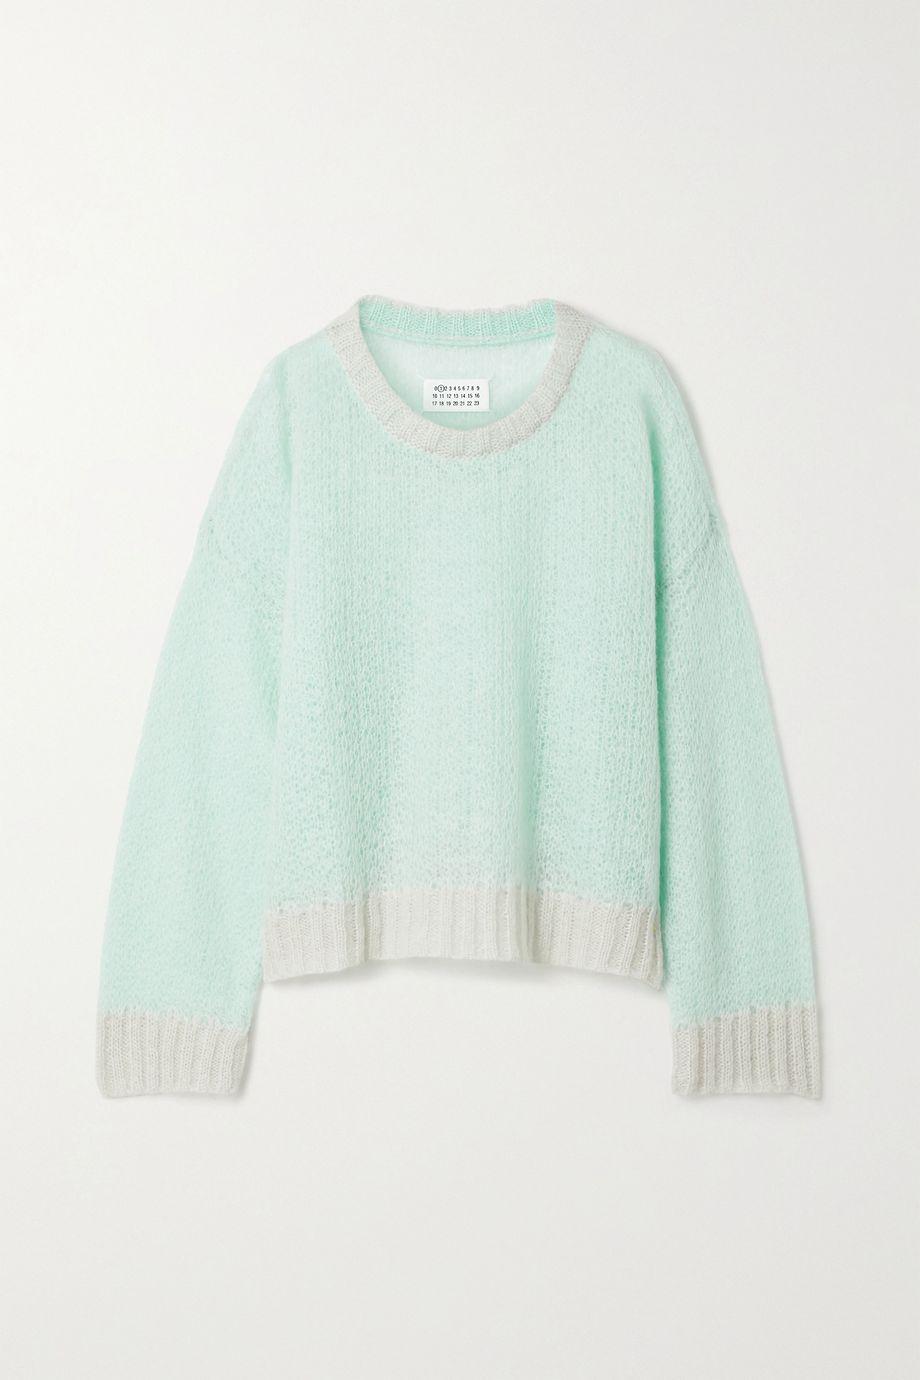 Maison Margiela Tubico oversized two-tone open-knit mohair-blend sweater